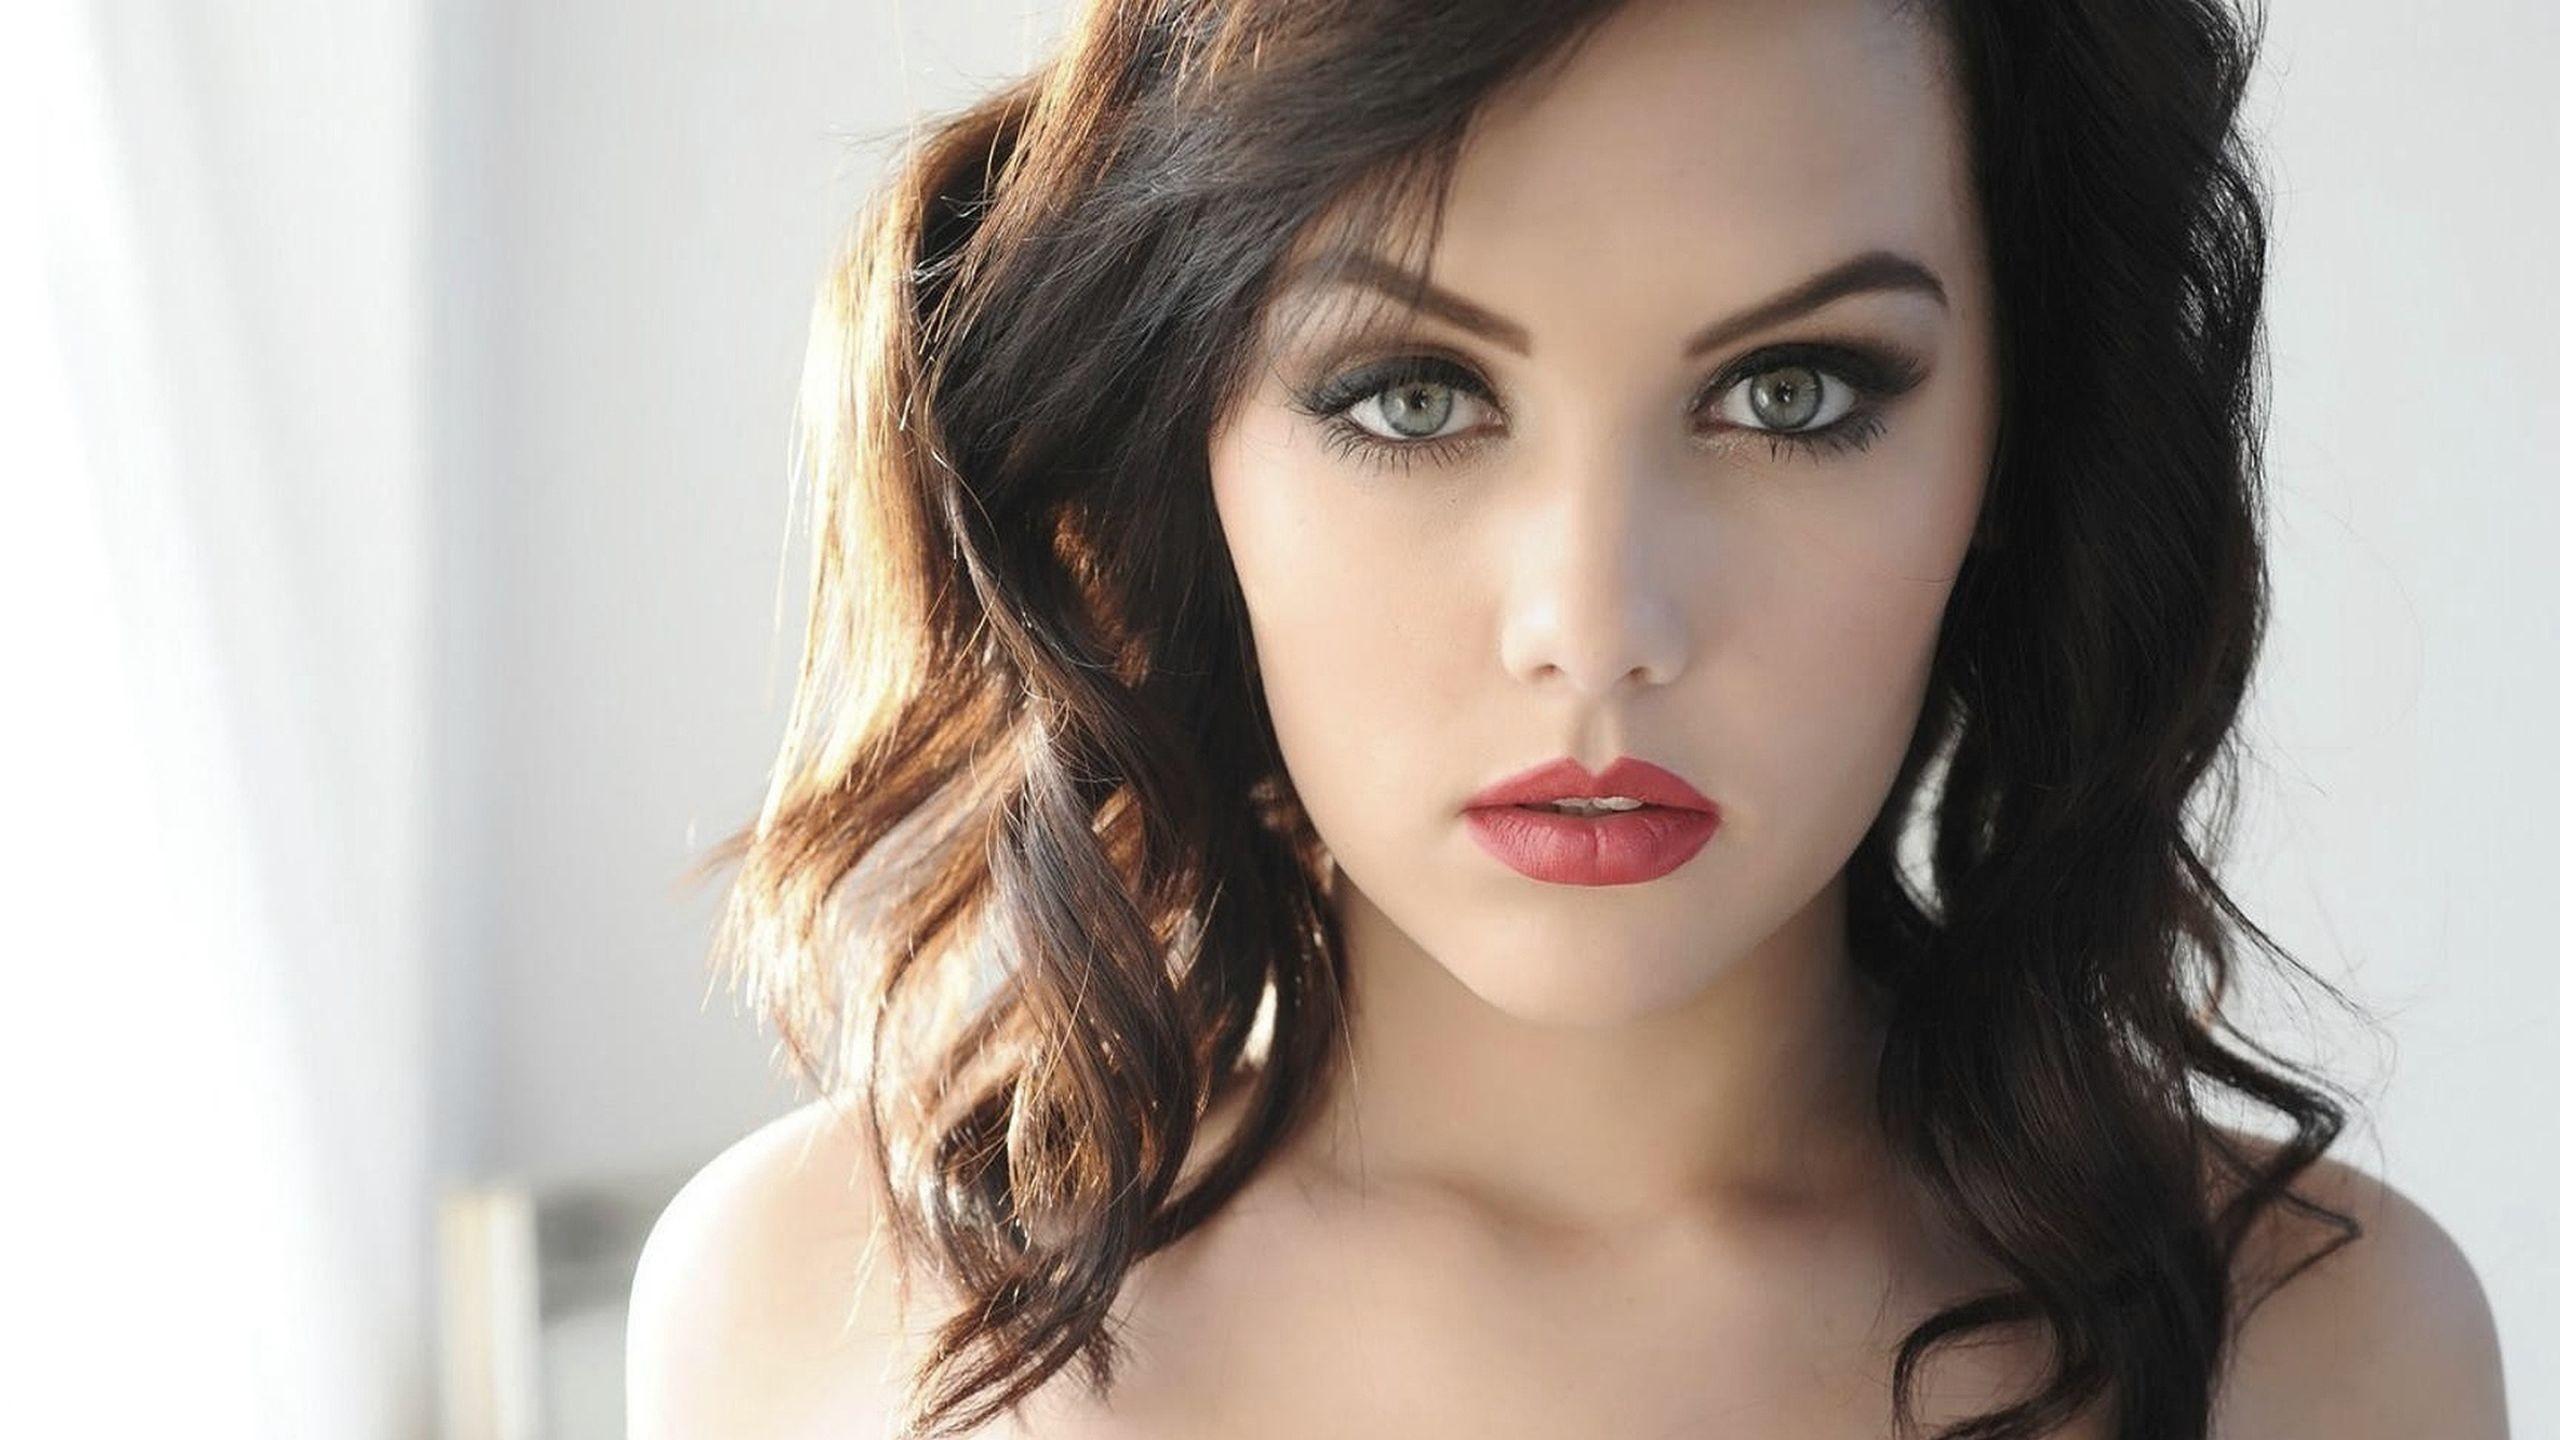 Beautiful Latina Layla Sin with cum dripping off pretty face № 942776 загрузить